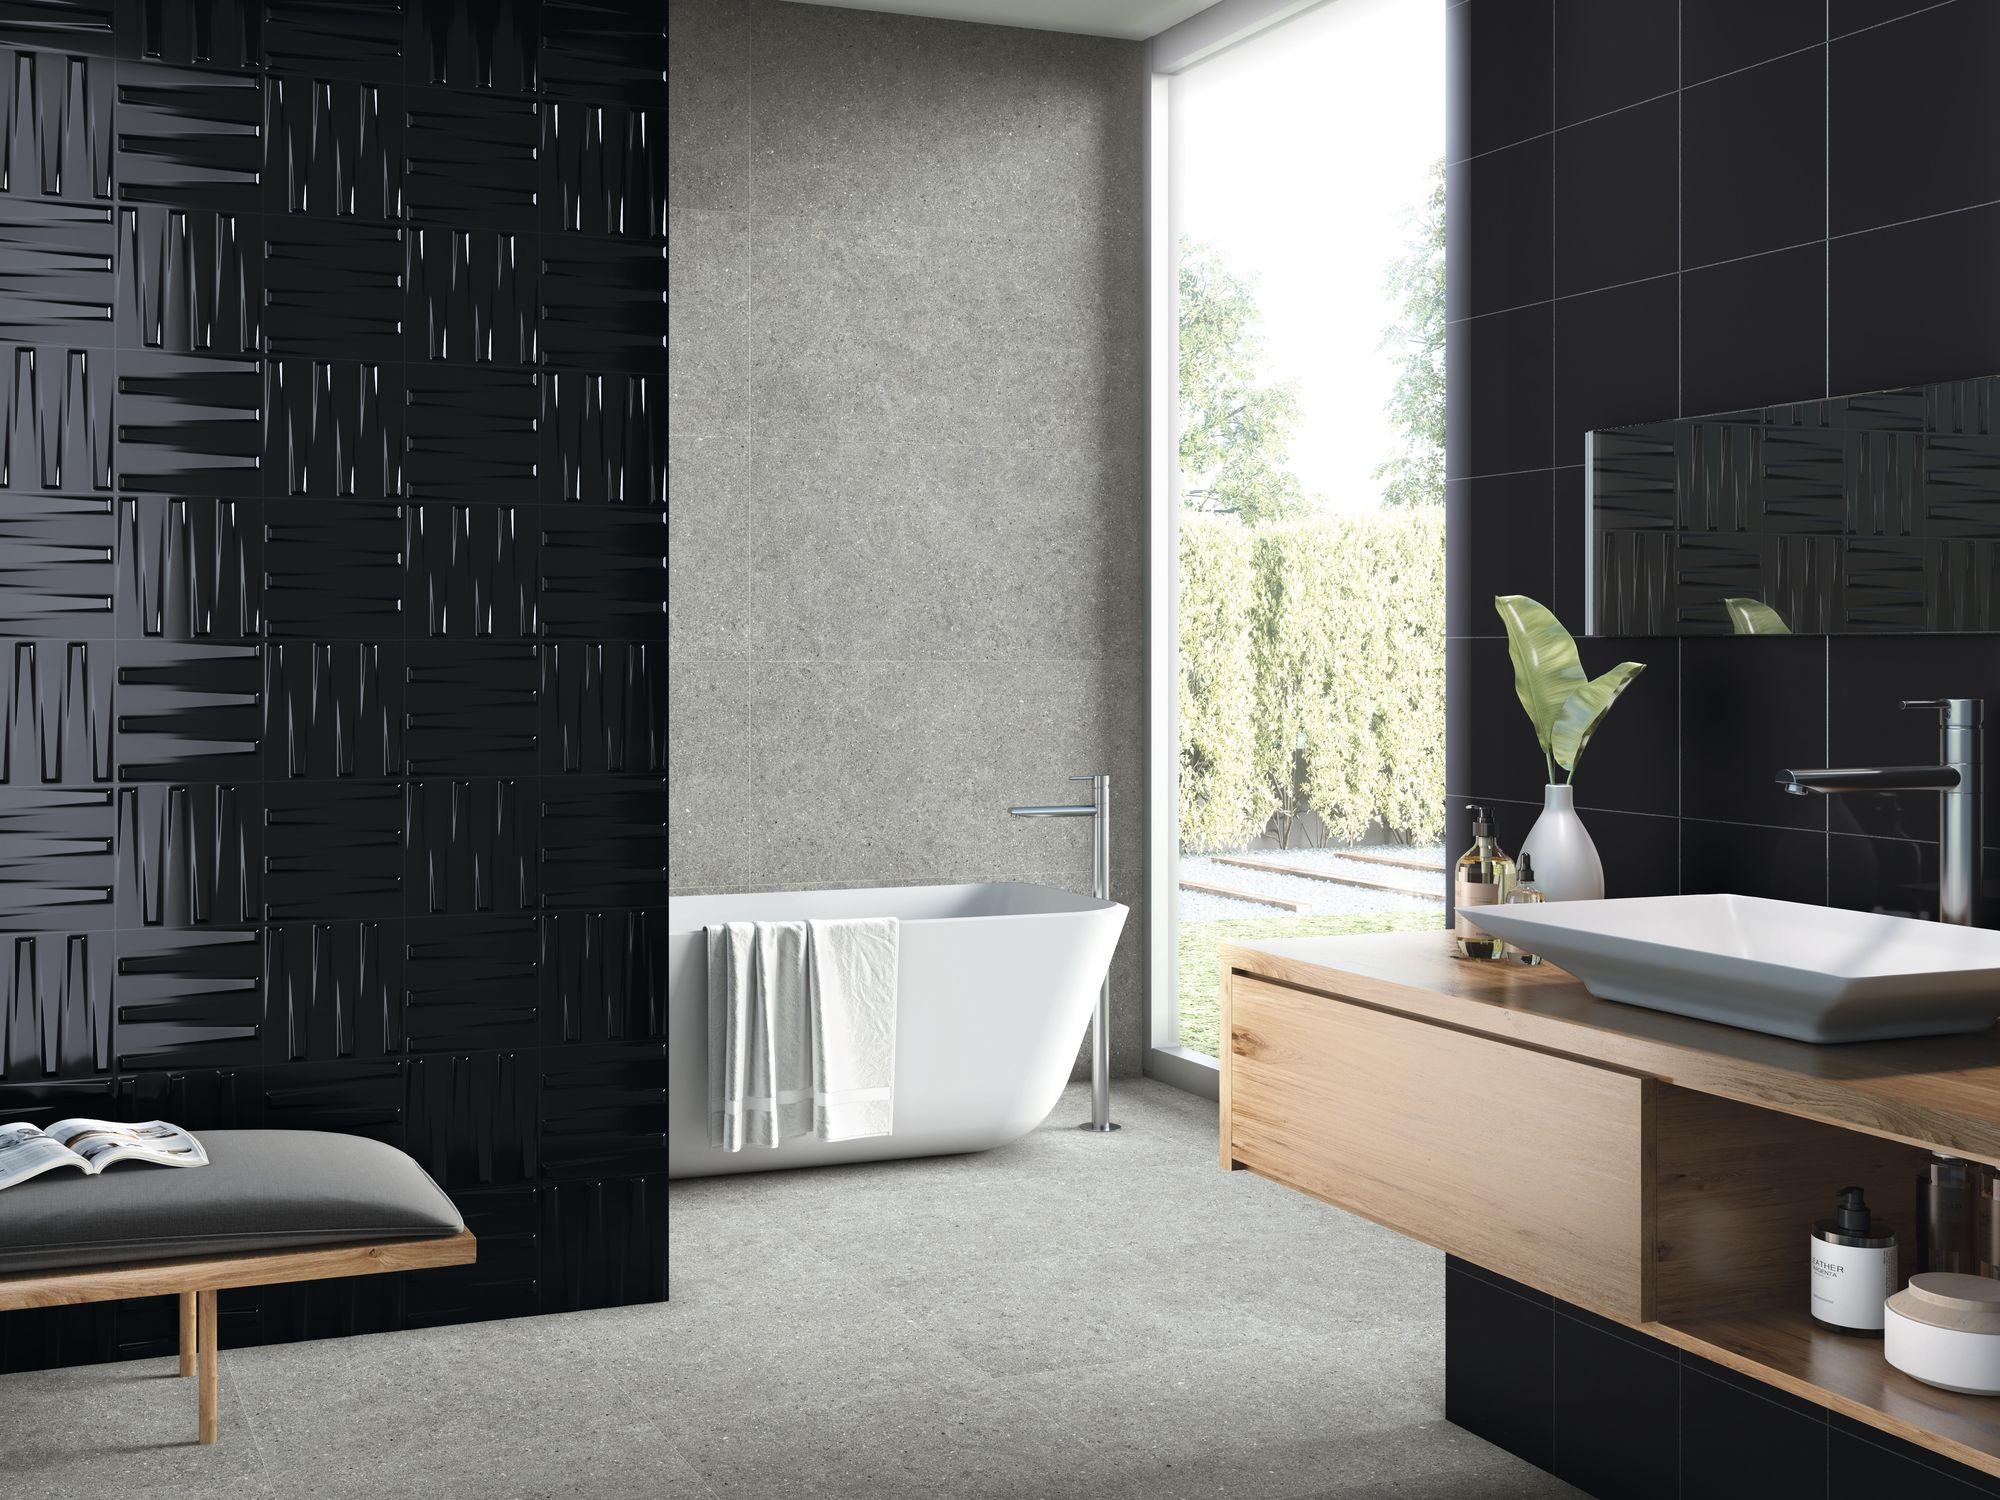 Dutton Black Gloss 25 x 25 cm. Black Gloss 25 x 25 cm. Brunswich Cromo 60 x 120 cm. Pavimento Brunswich Cromo 60 x 60 cm.